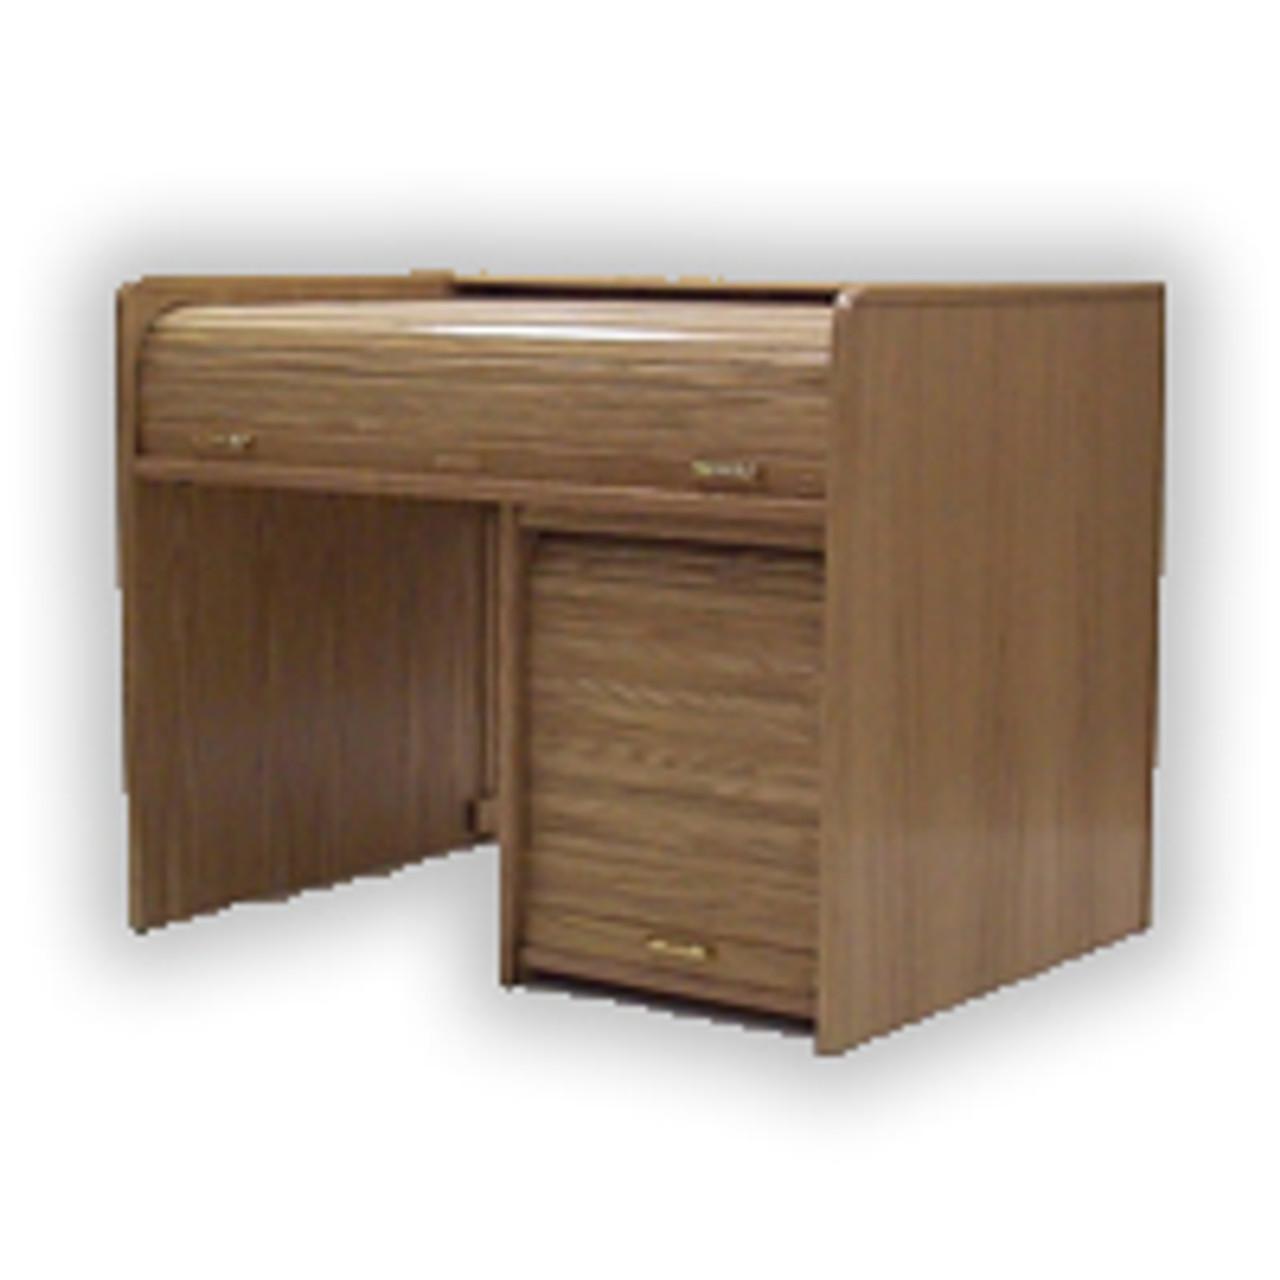 Equipment Desks